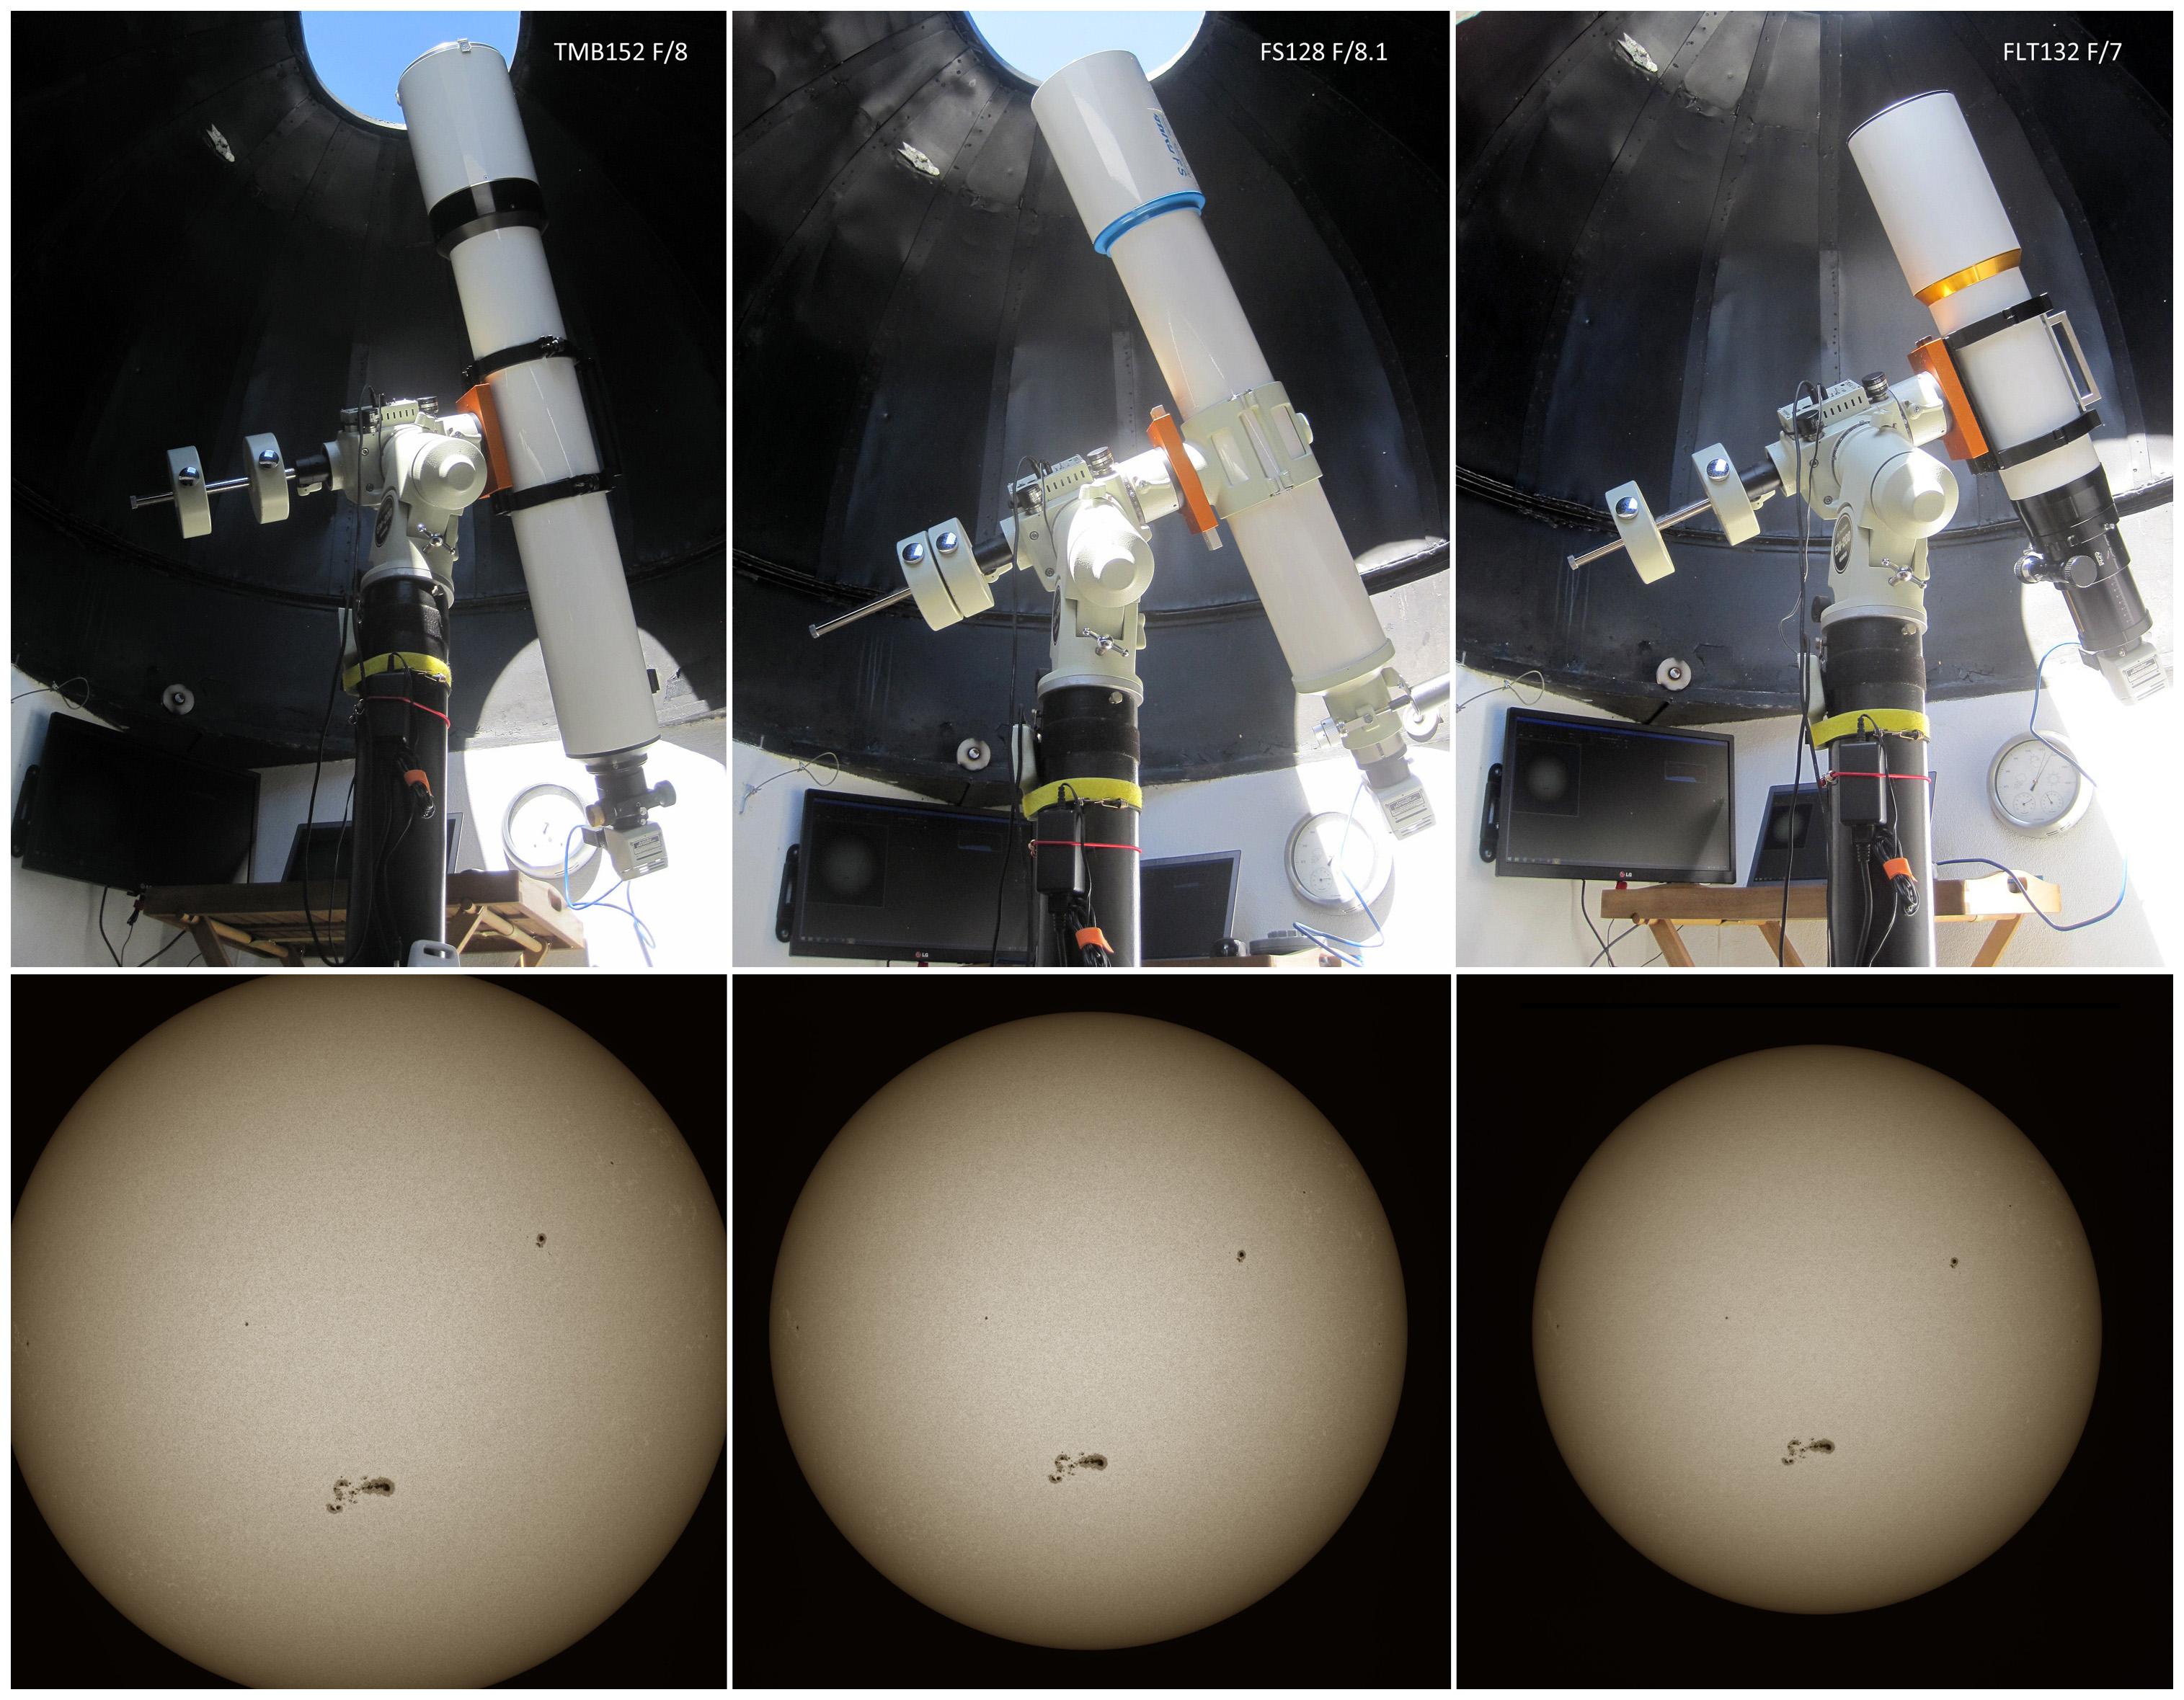 solar_imaging_session_20150807_REFRACTORS